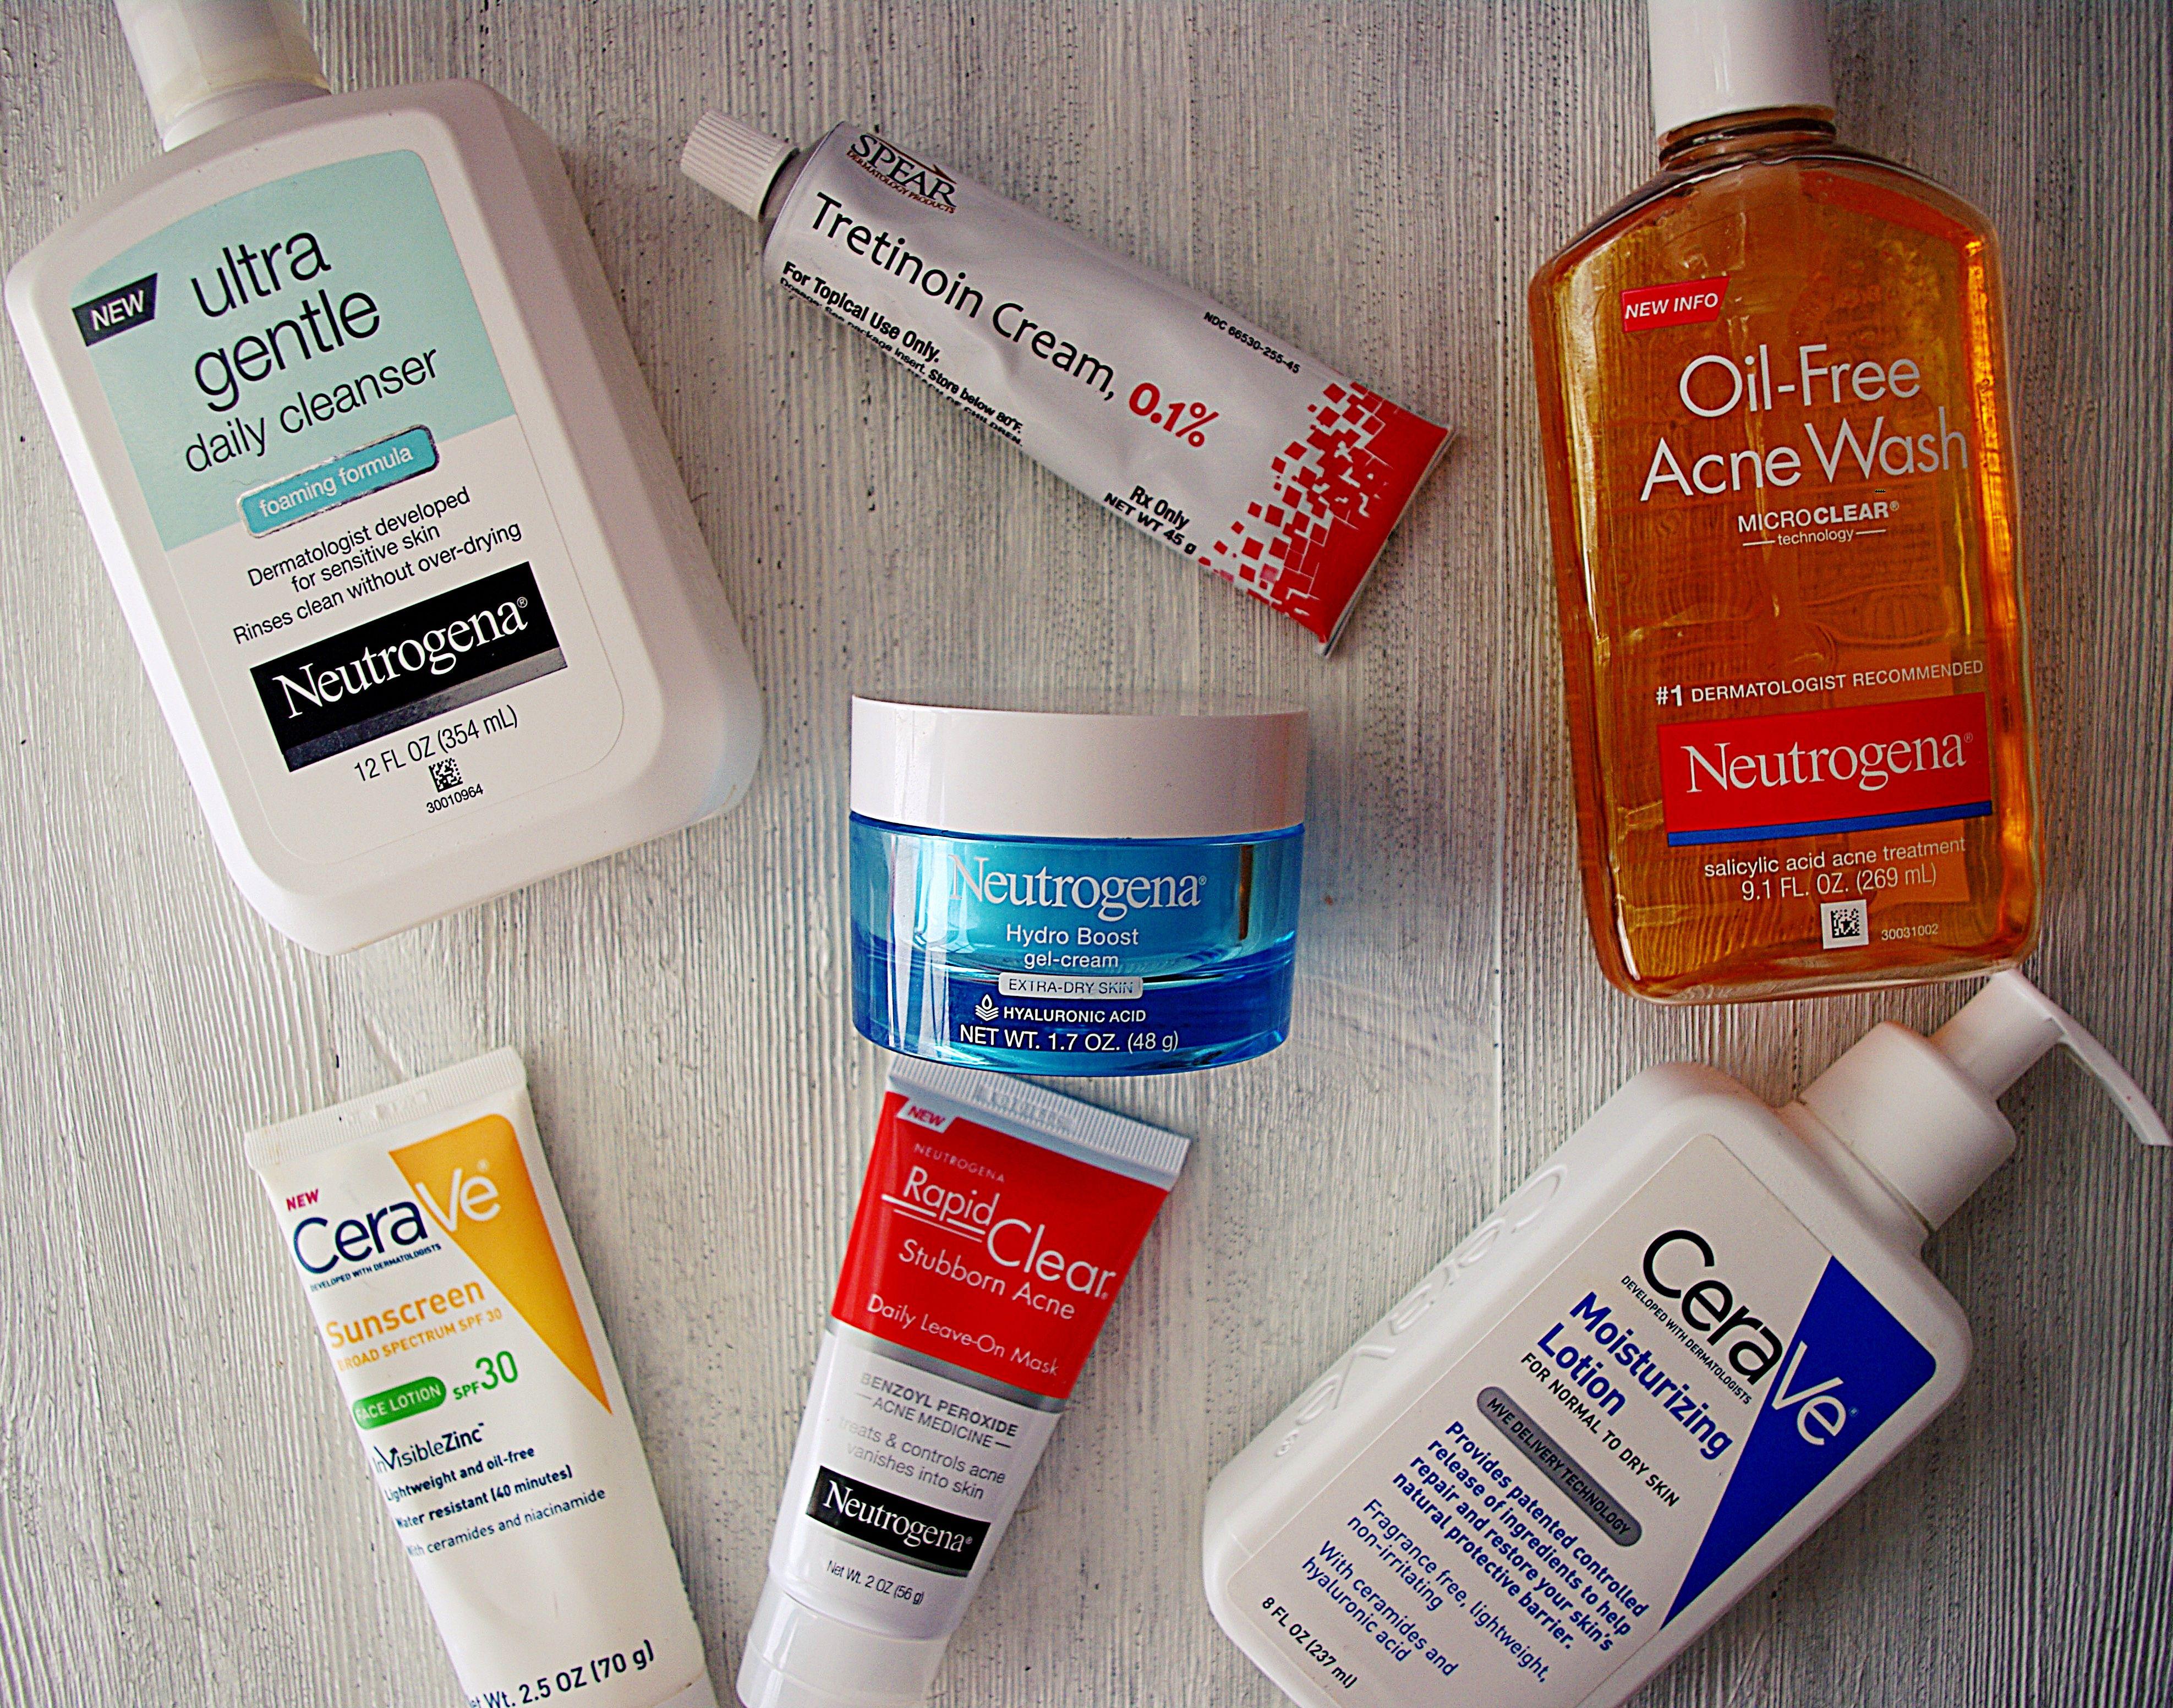 Post Accutane Update Skin Care Routine Skin Care Accutane Skin Care Hair Care